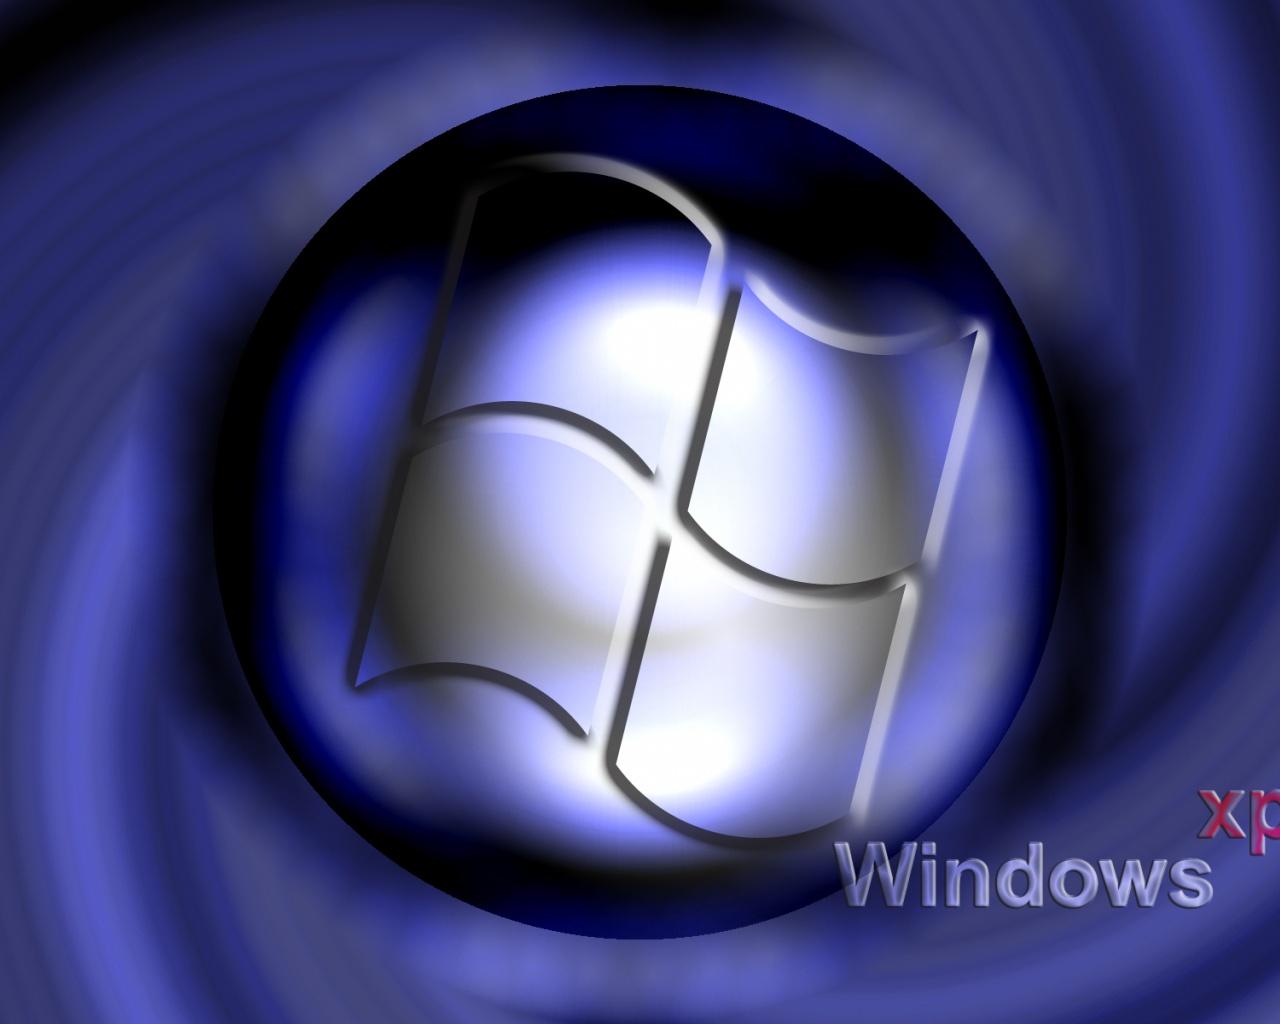 1280x1024 Windows XP desktop PC and Mac wallpaper 1280x1024